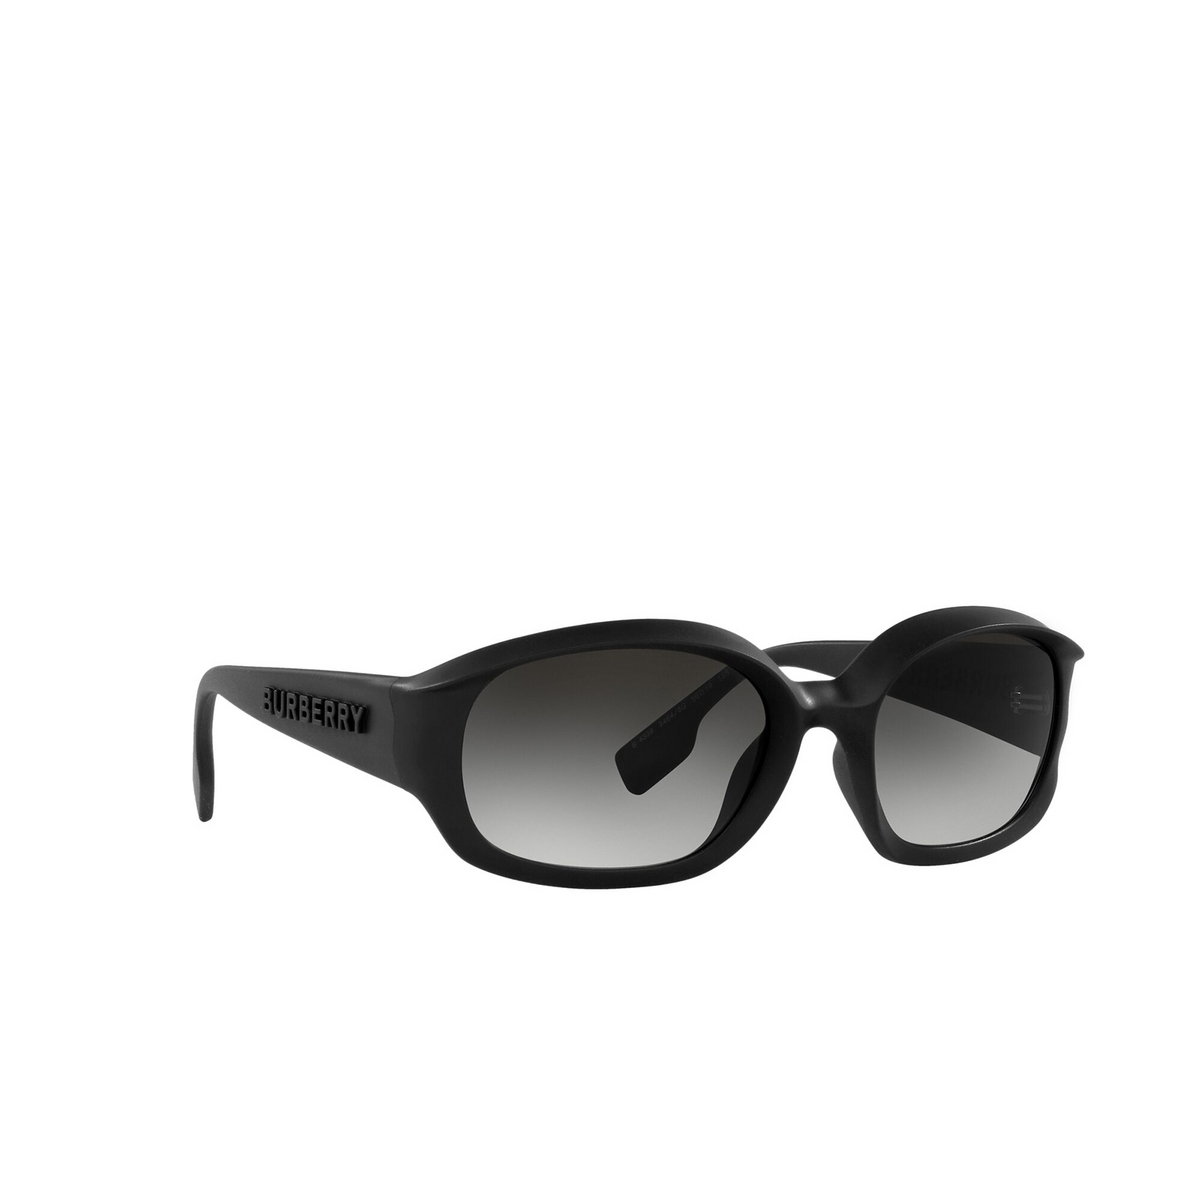 Burberry® Oval Sunglasses: Milton BE4338 color Black 34648G - three-quarters view.